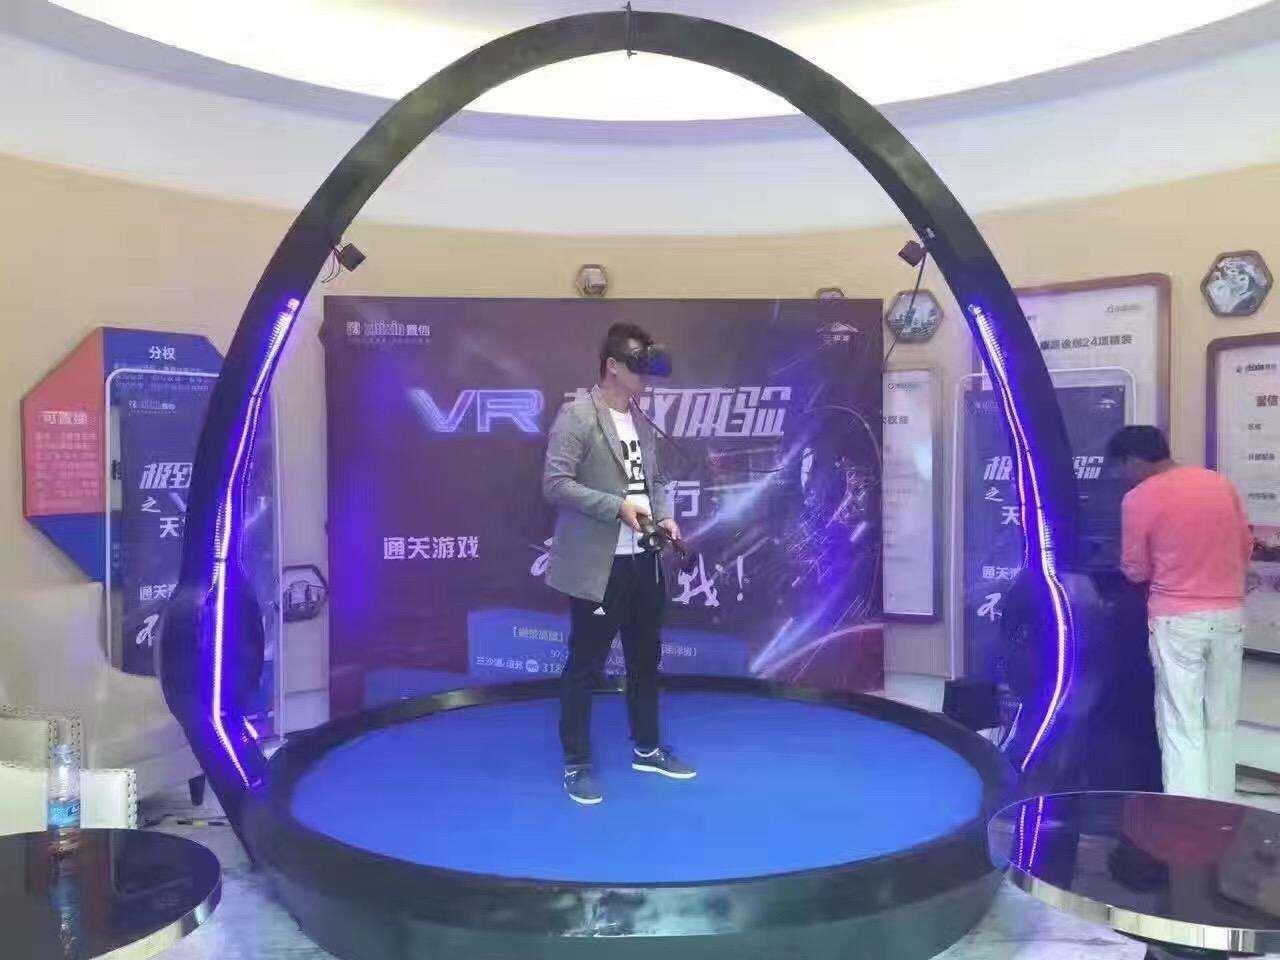 VR天地行大型商场暖场设备 VR设备 VR娱乐暖场示例图1